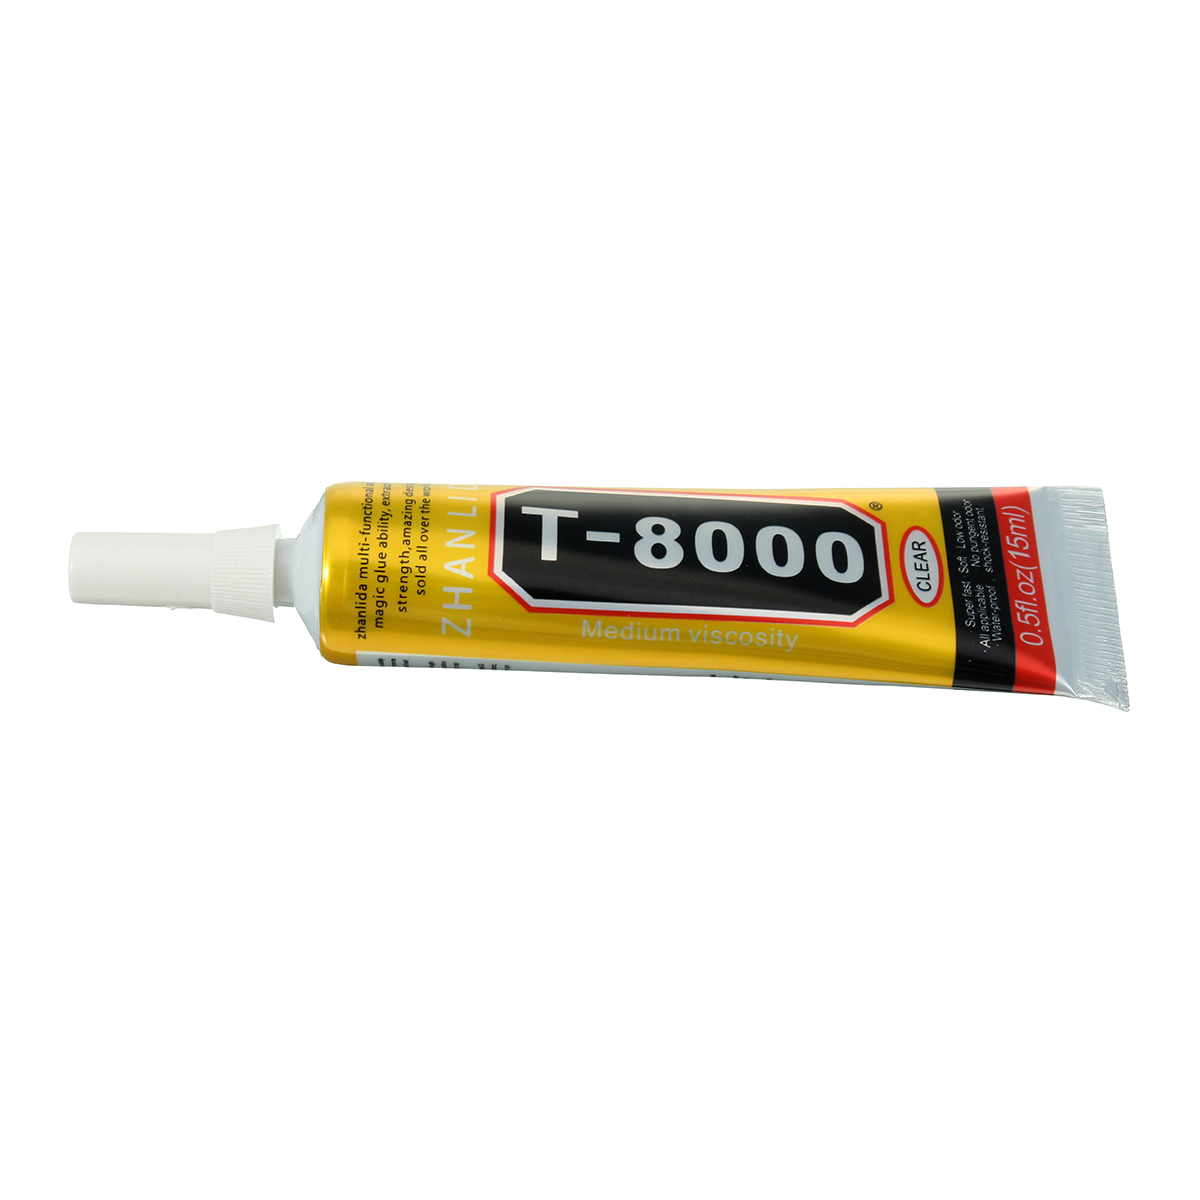 T-8000 15ml Epoxy Resin Multi Purpose LED Phone Screen Shell Repair Liquid  Glue DIY Craft T8000 Glue